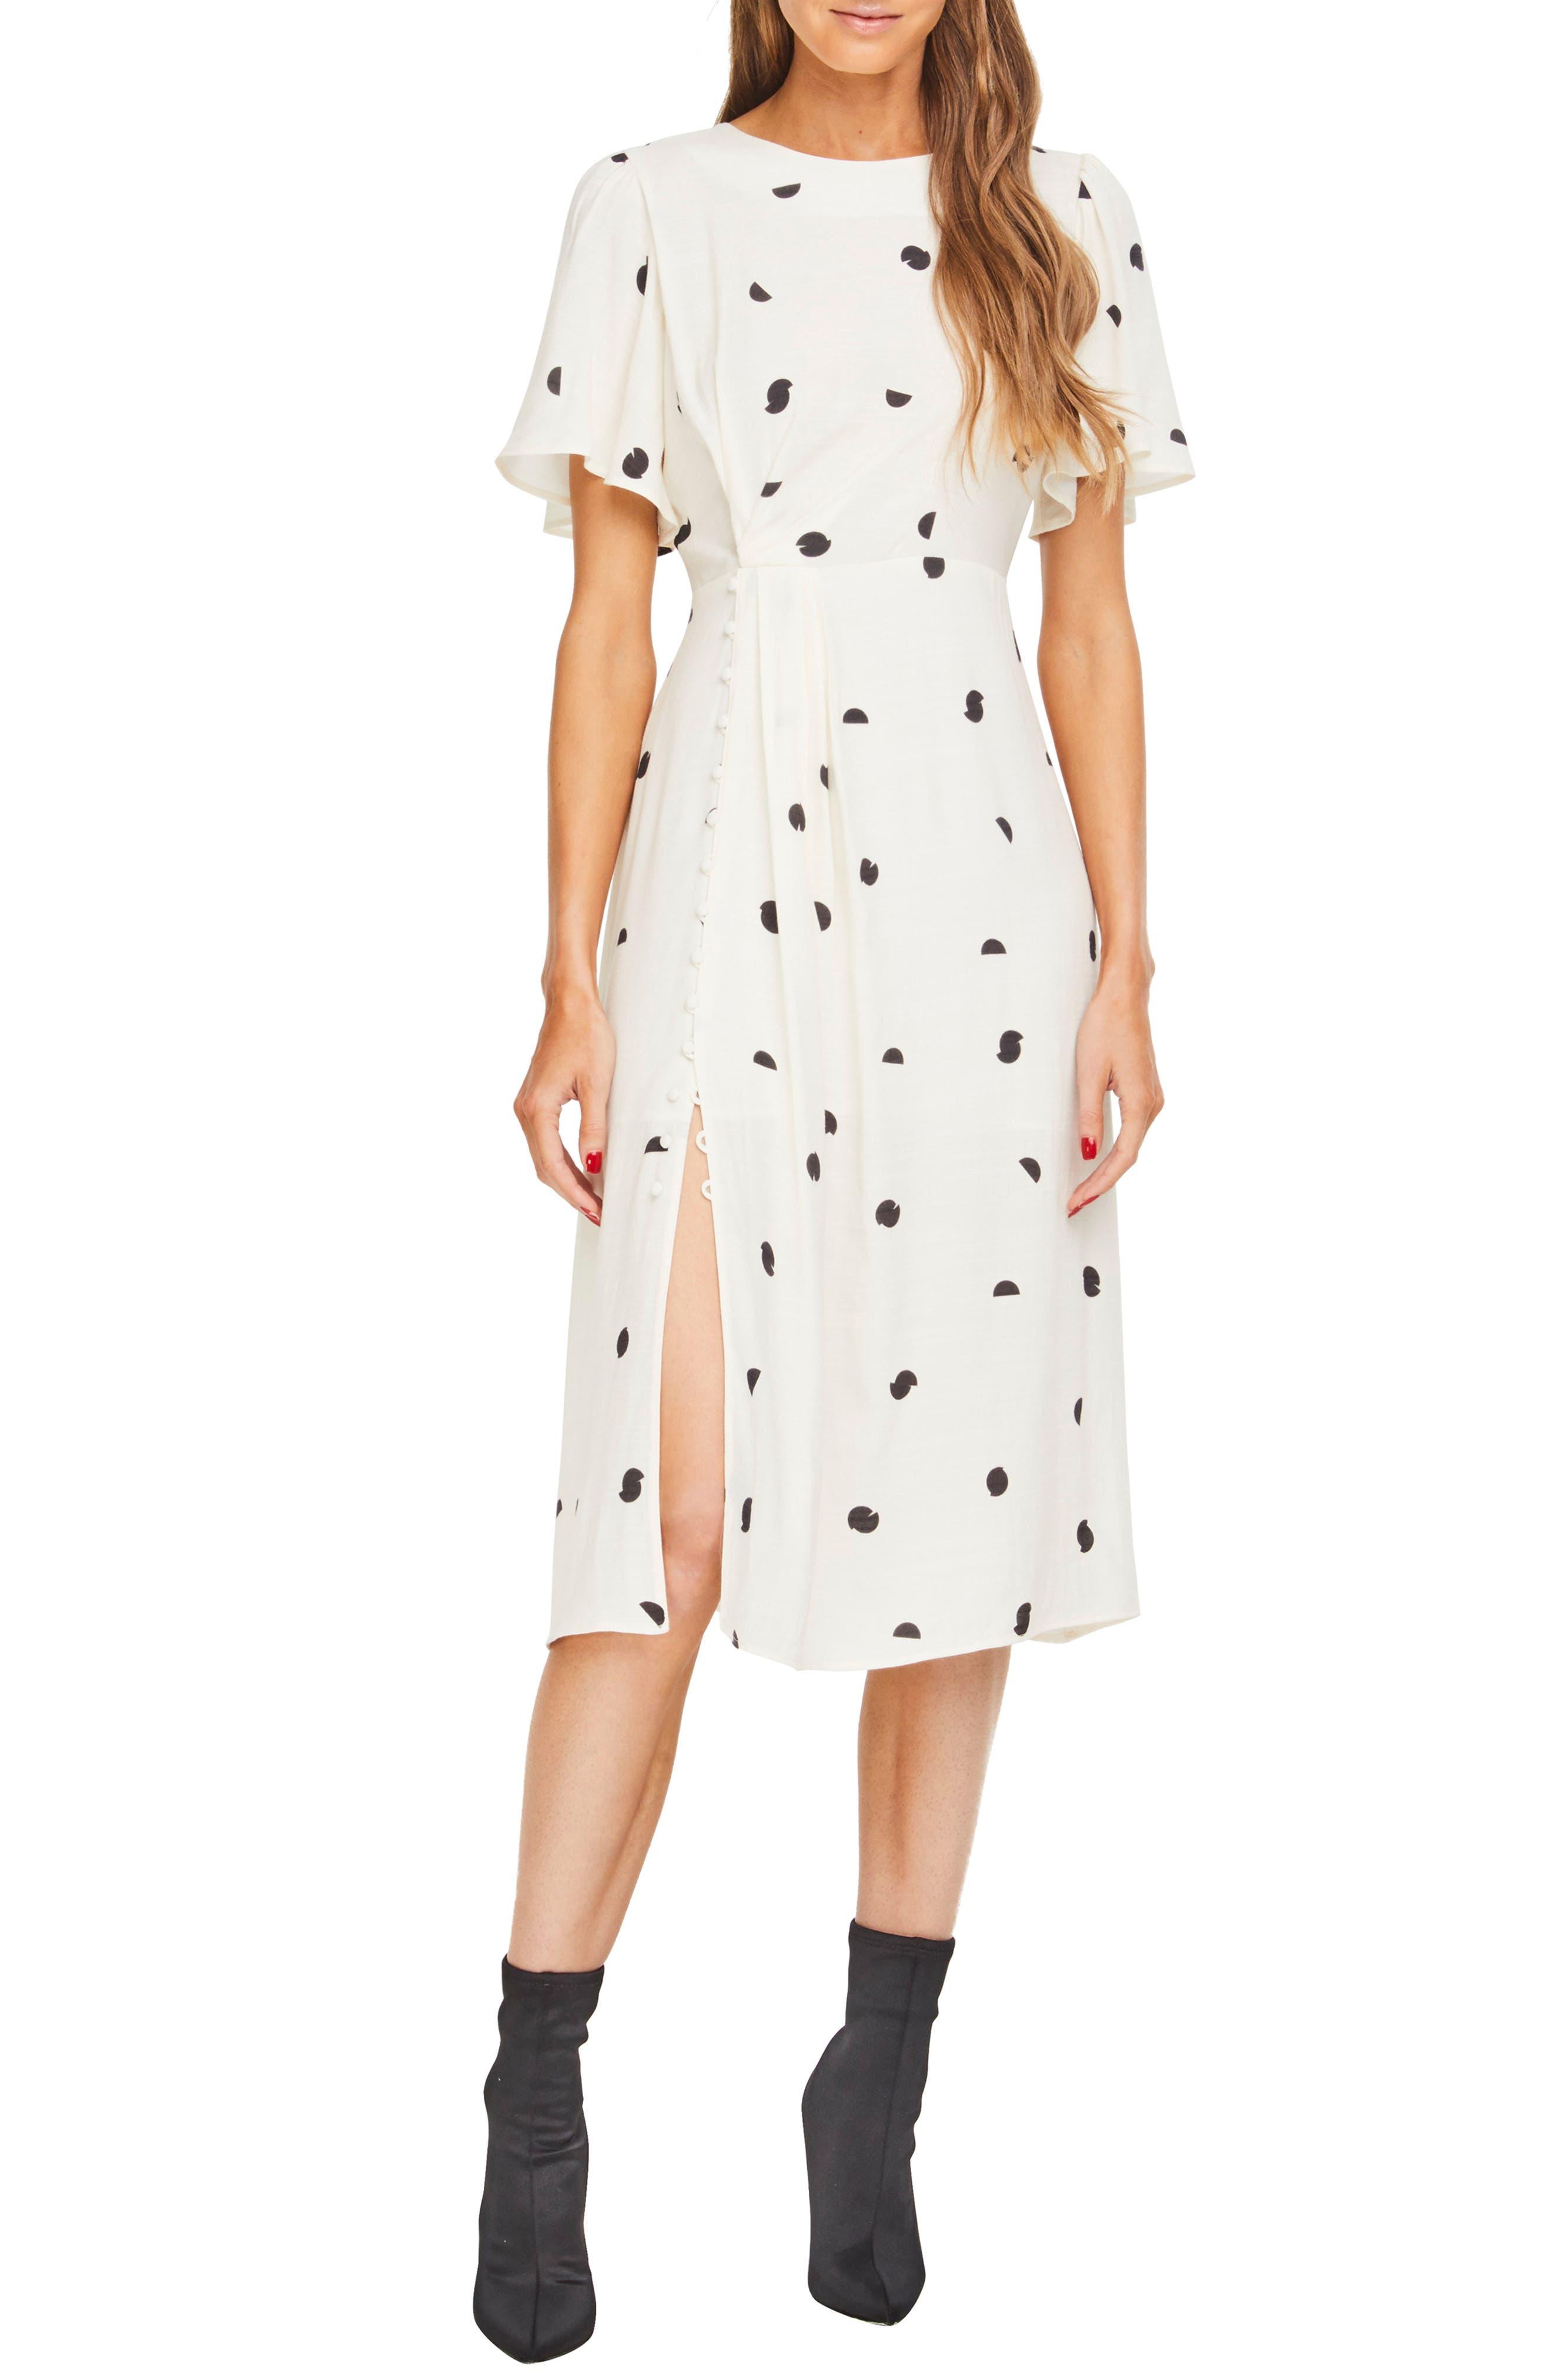 ASTR THE LABEL Ebony Dress, Main, color, 900